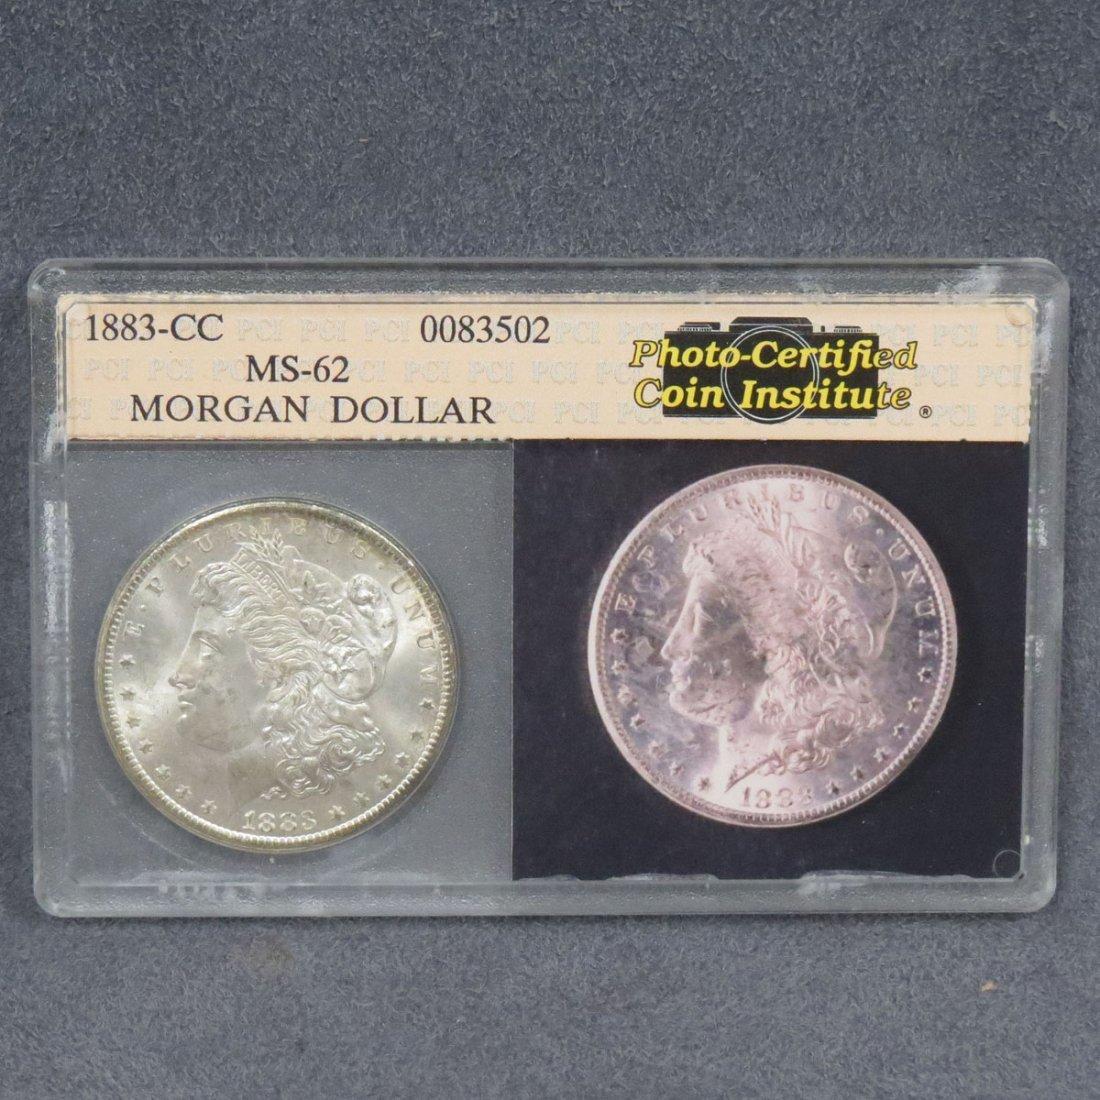 1883-CC MORGAN SILVER DOLLAR (MS-62)